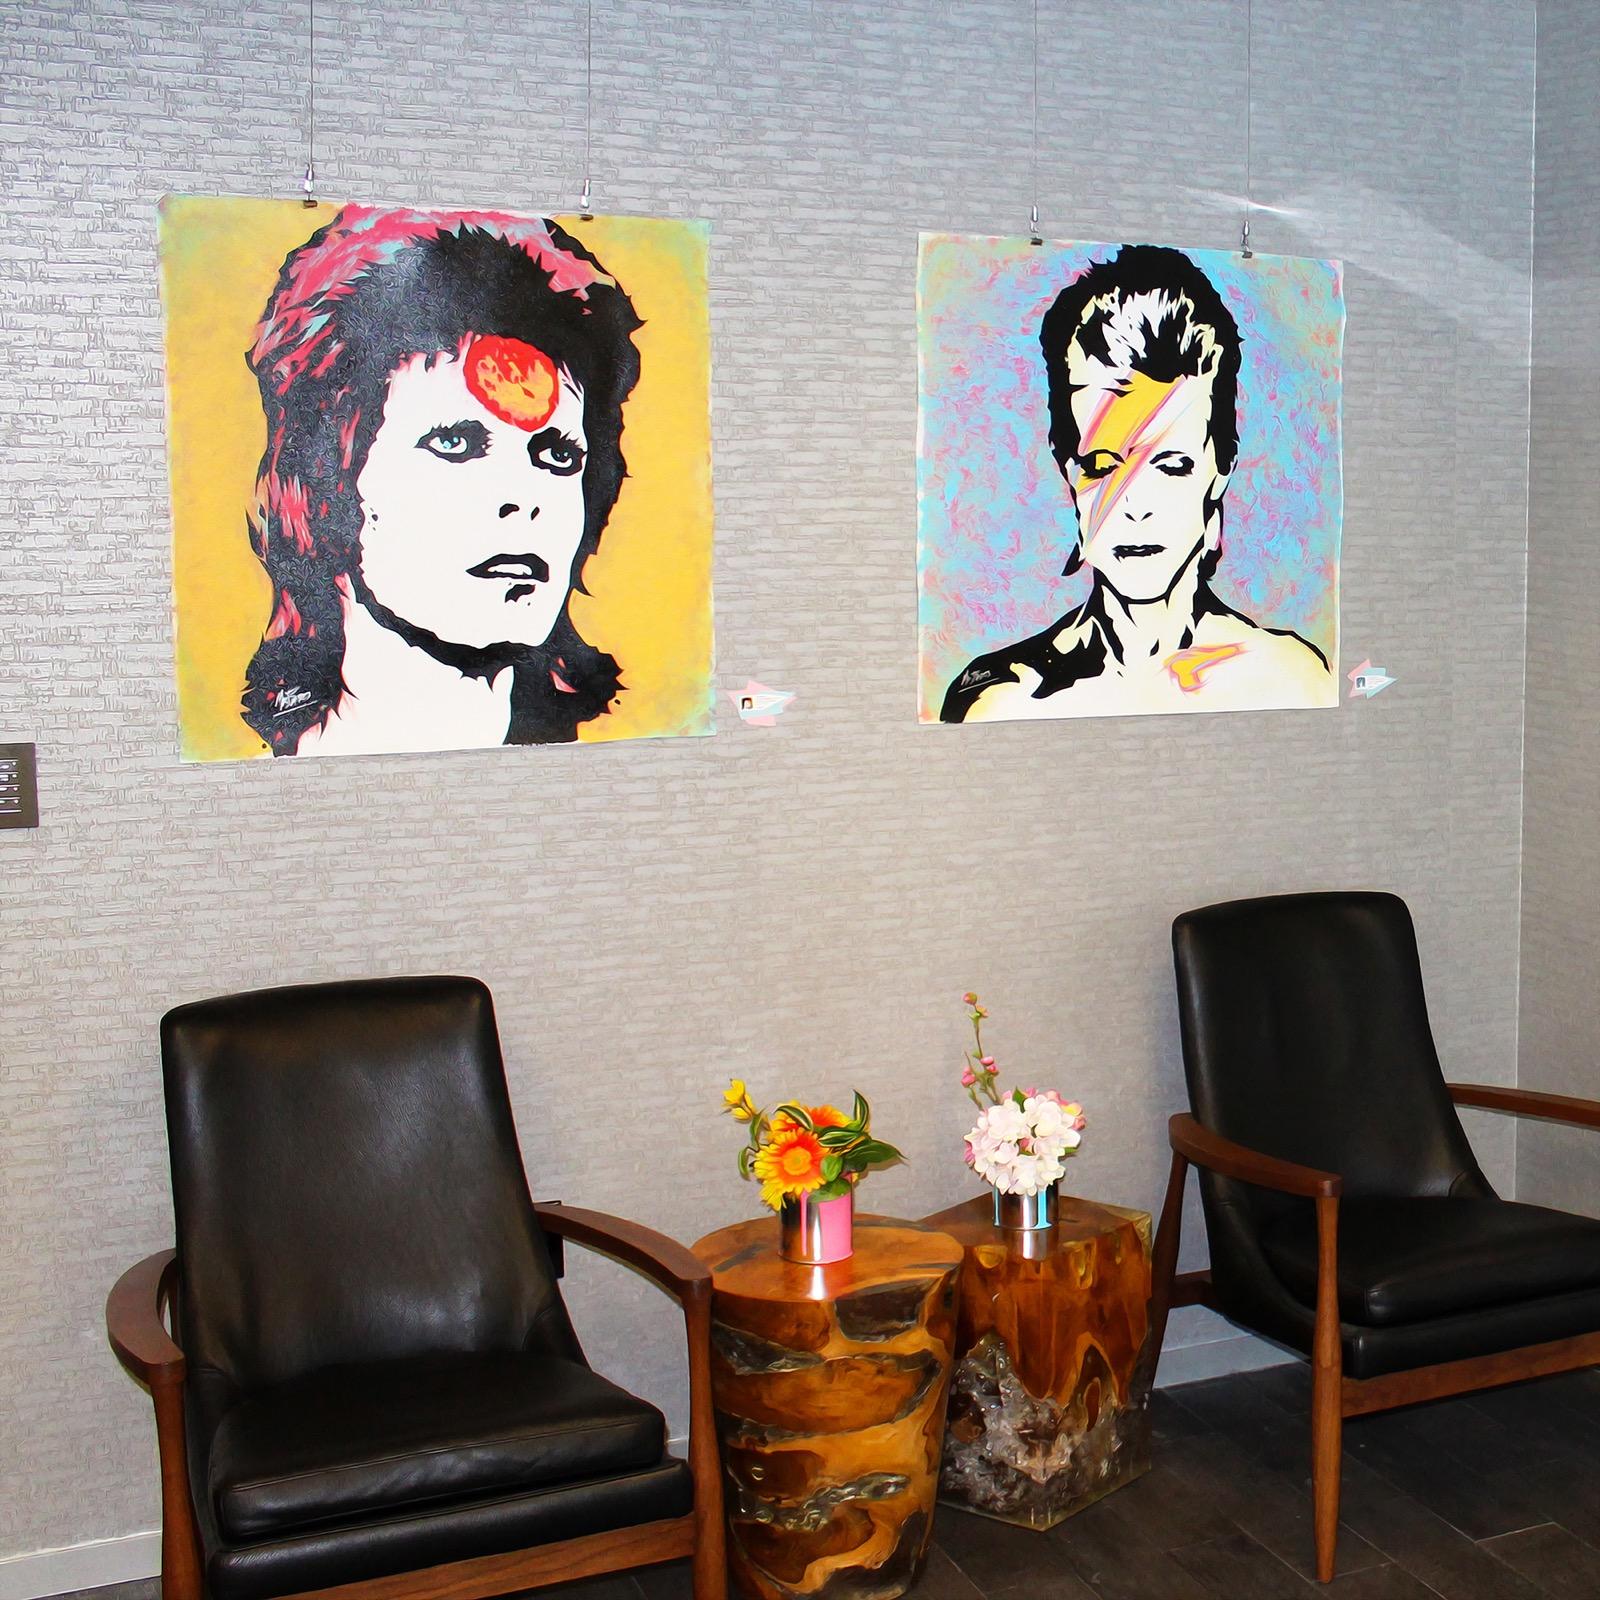 David Bowie Pop Art Miami